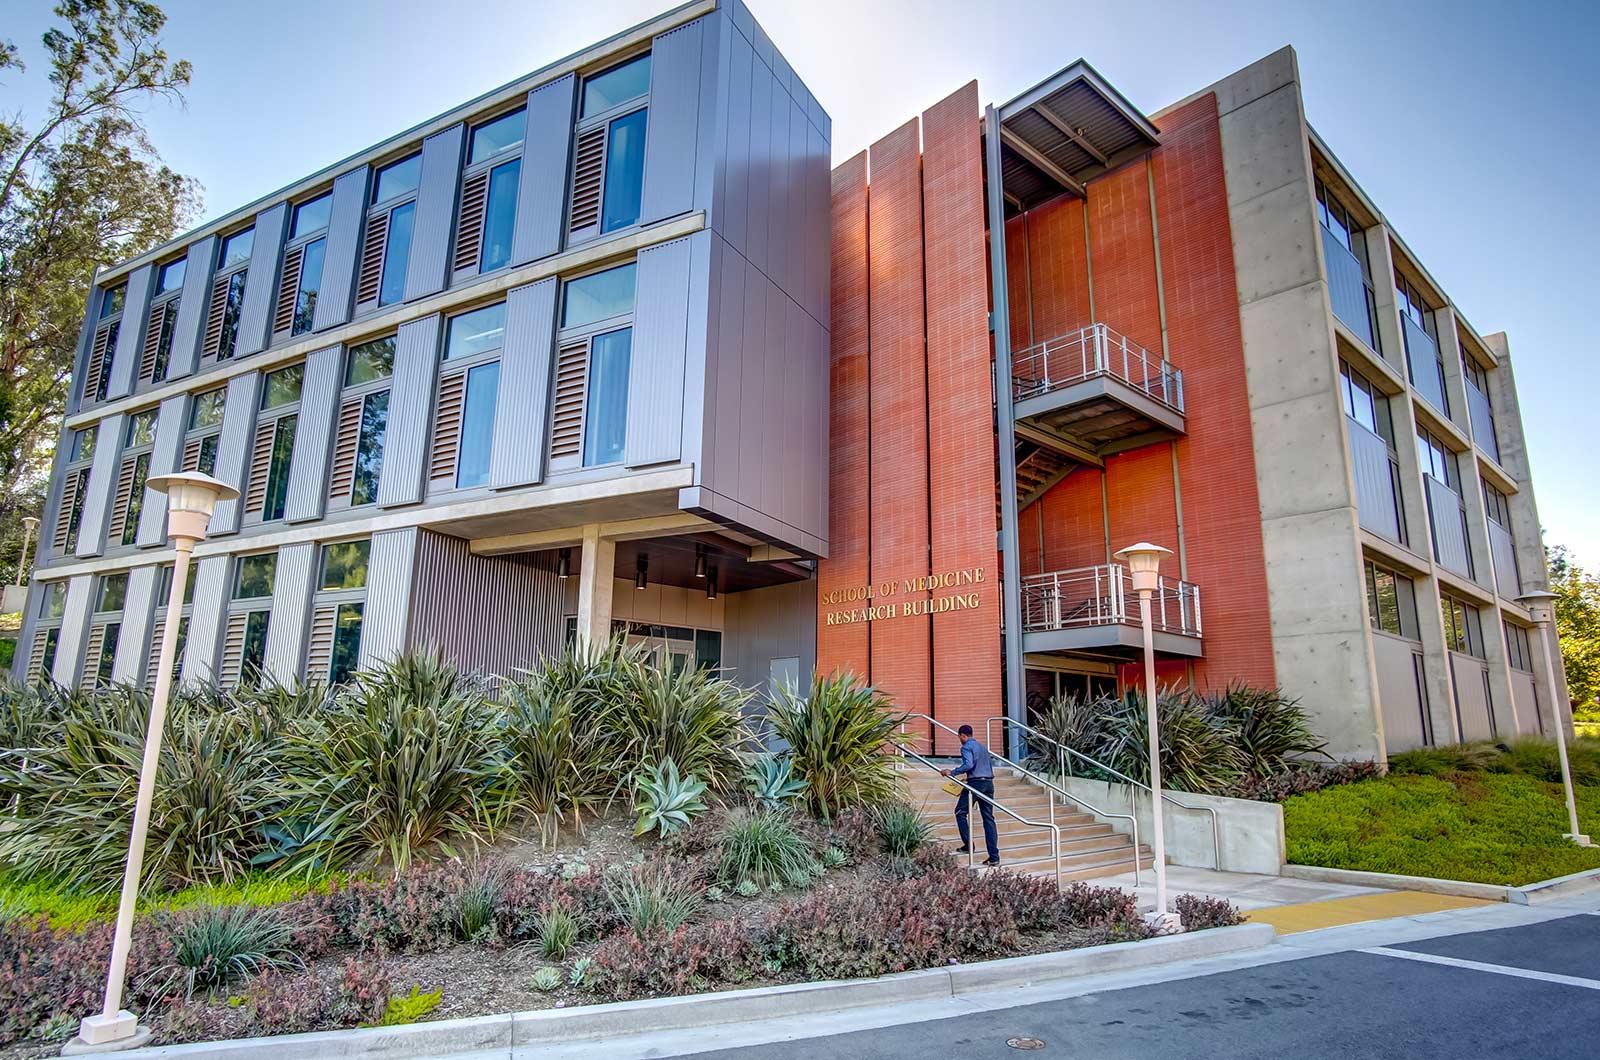 Modern-Library-At-University-360-Tours-Virtual-Tour-Company-College-Vitual-Tours-Virtual-Tours-For-College